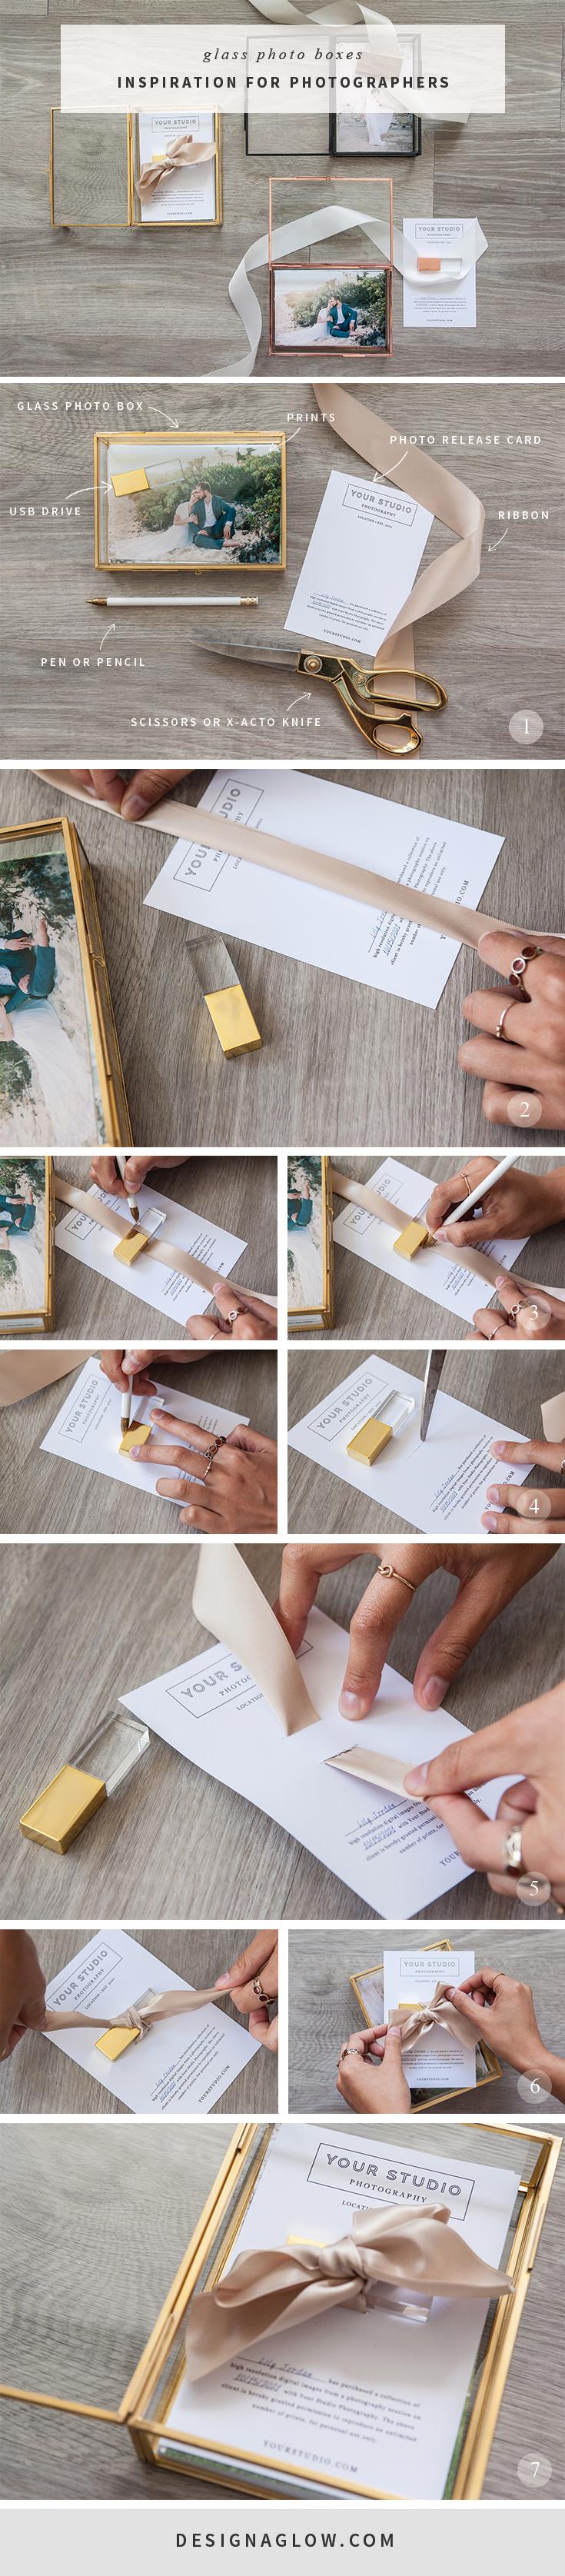 DIY: Photo Box Inspiration for Photographers | Usb drive, Box and Glass